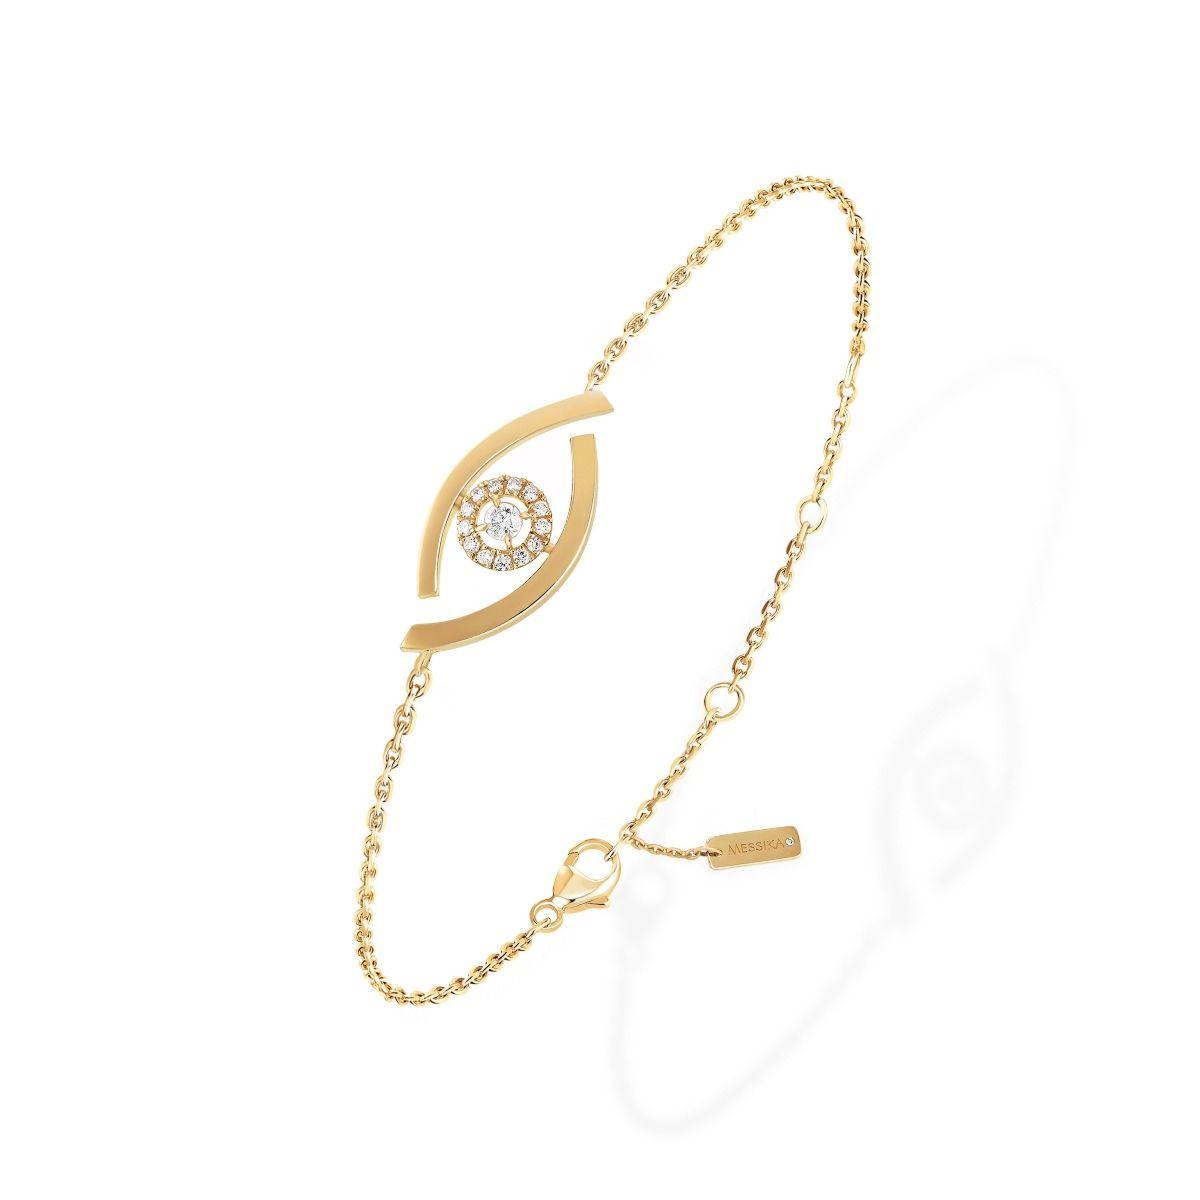 Lucky Eye BRACELET - YELLOW GOLD